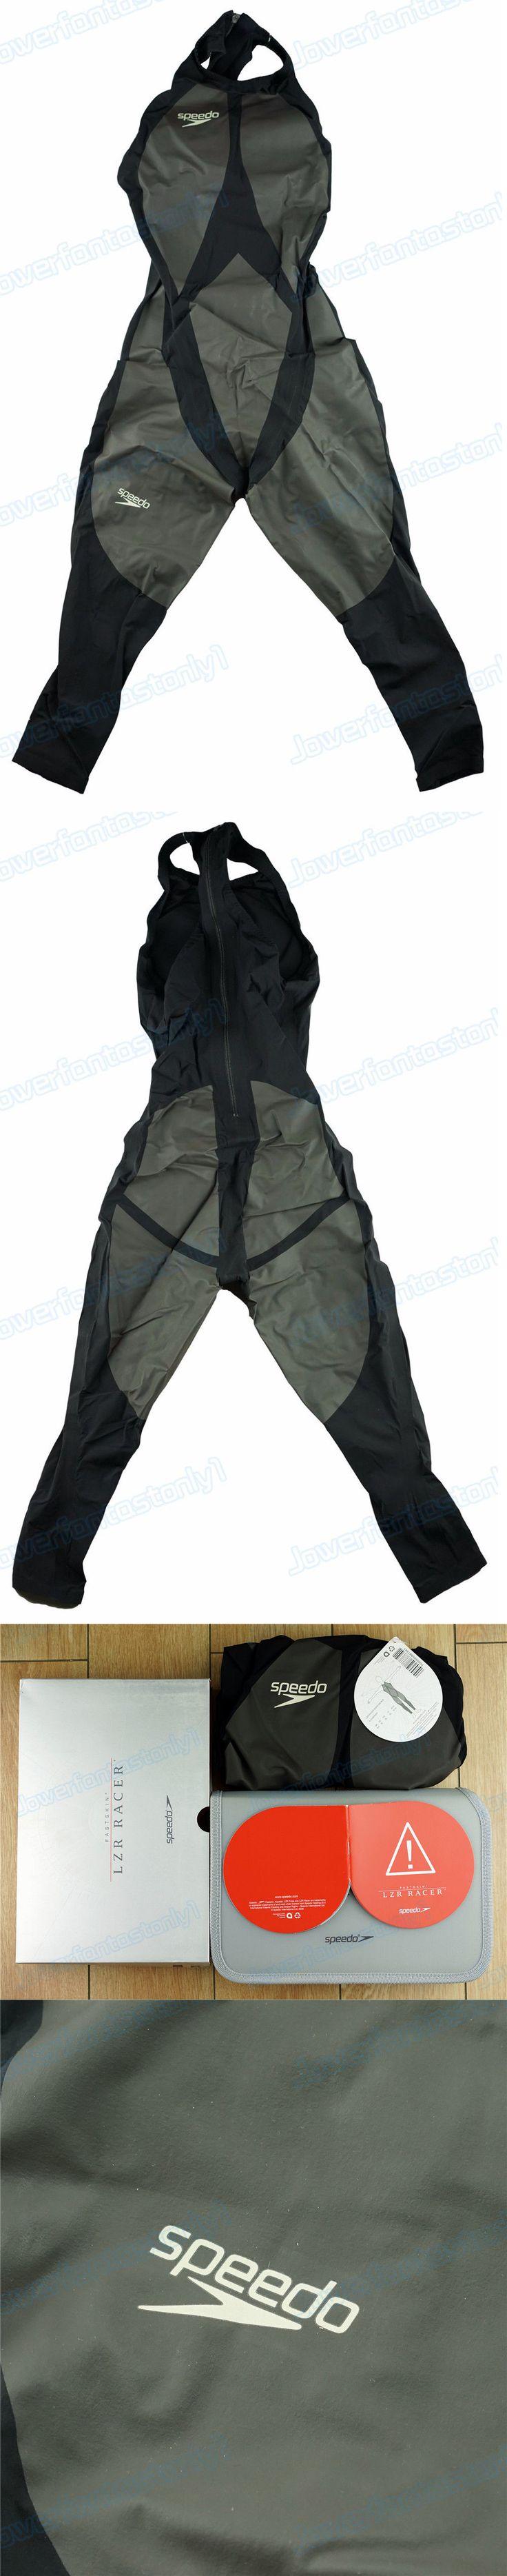 Men 140041: * Brand New * Michael Phelps Fastskin Lzr Swim Suit Trunks Slo -> BUY IT NOW ONLY: $120 on eBay!